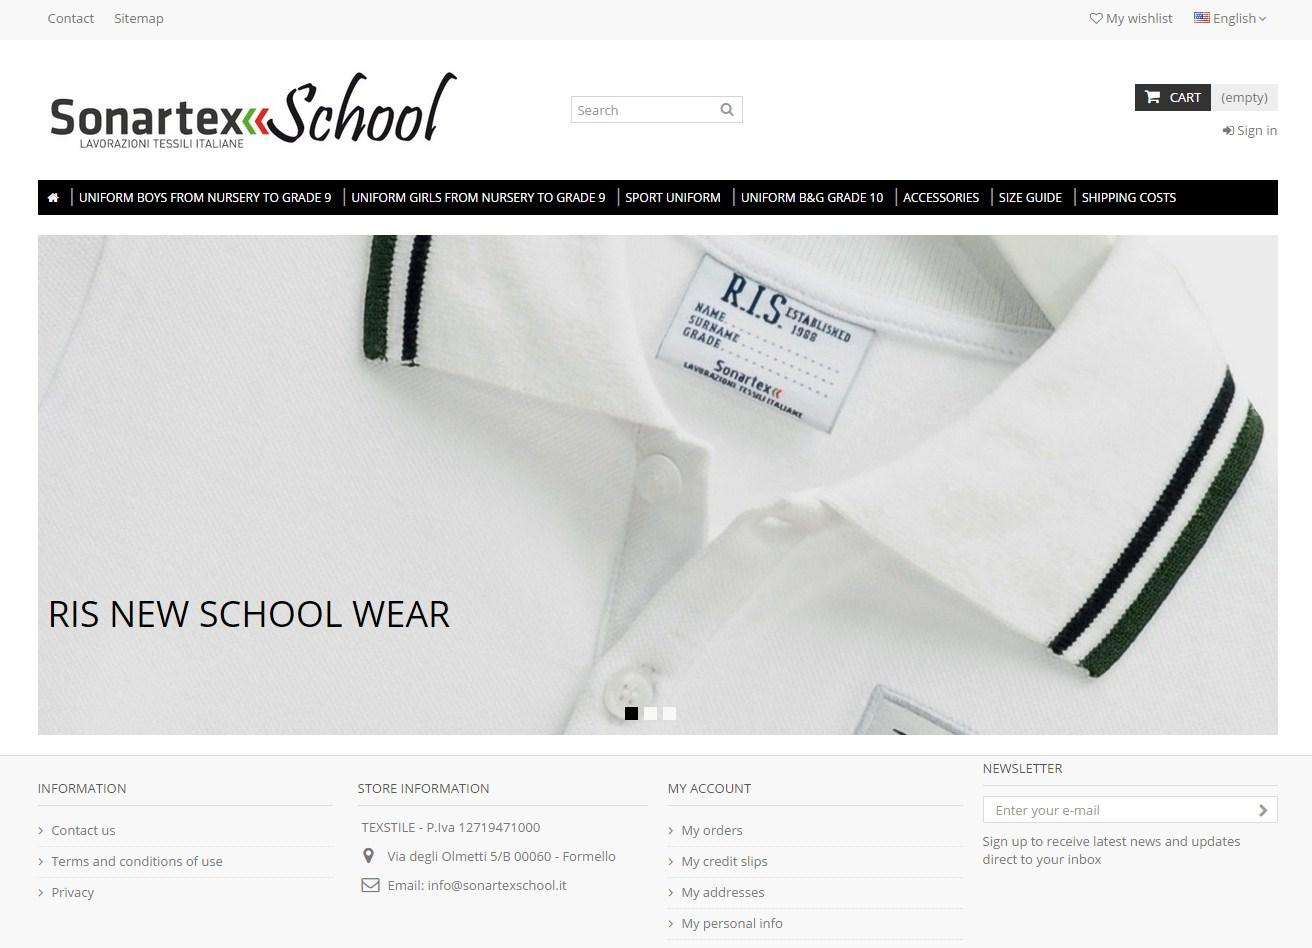 Sonartexschool